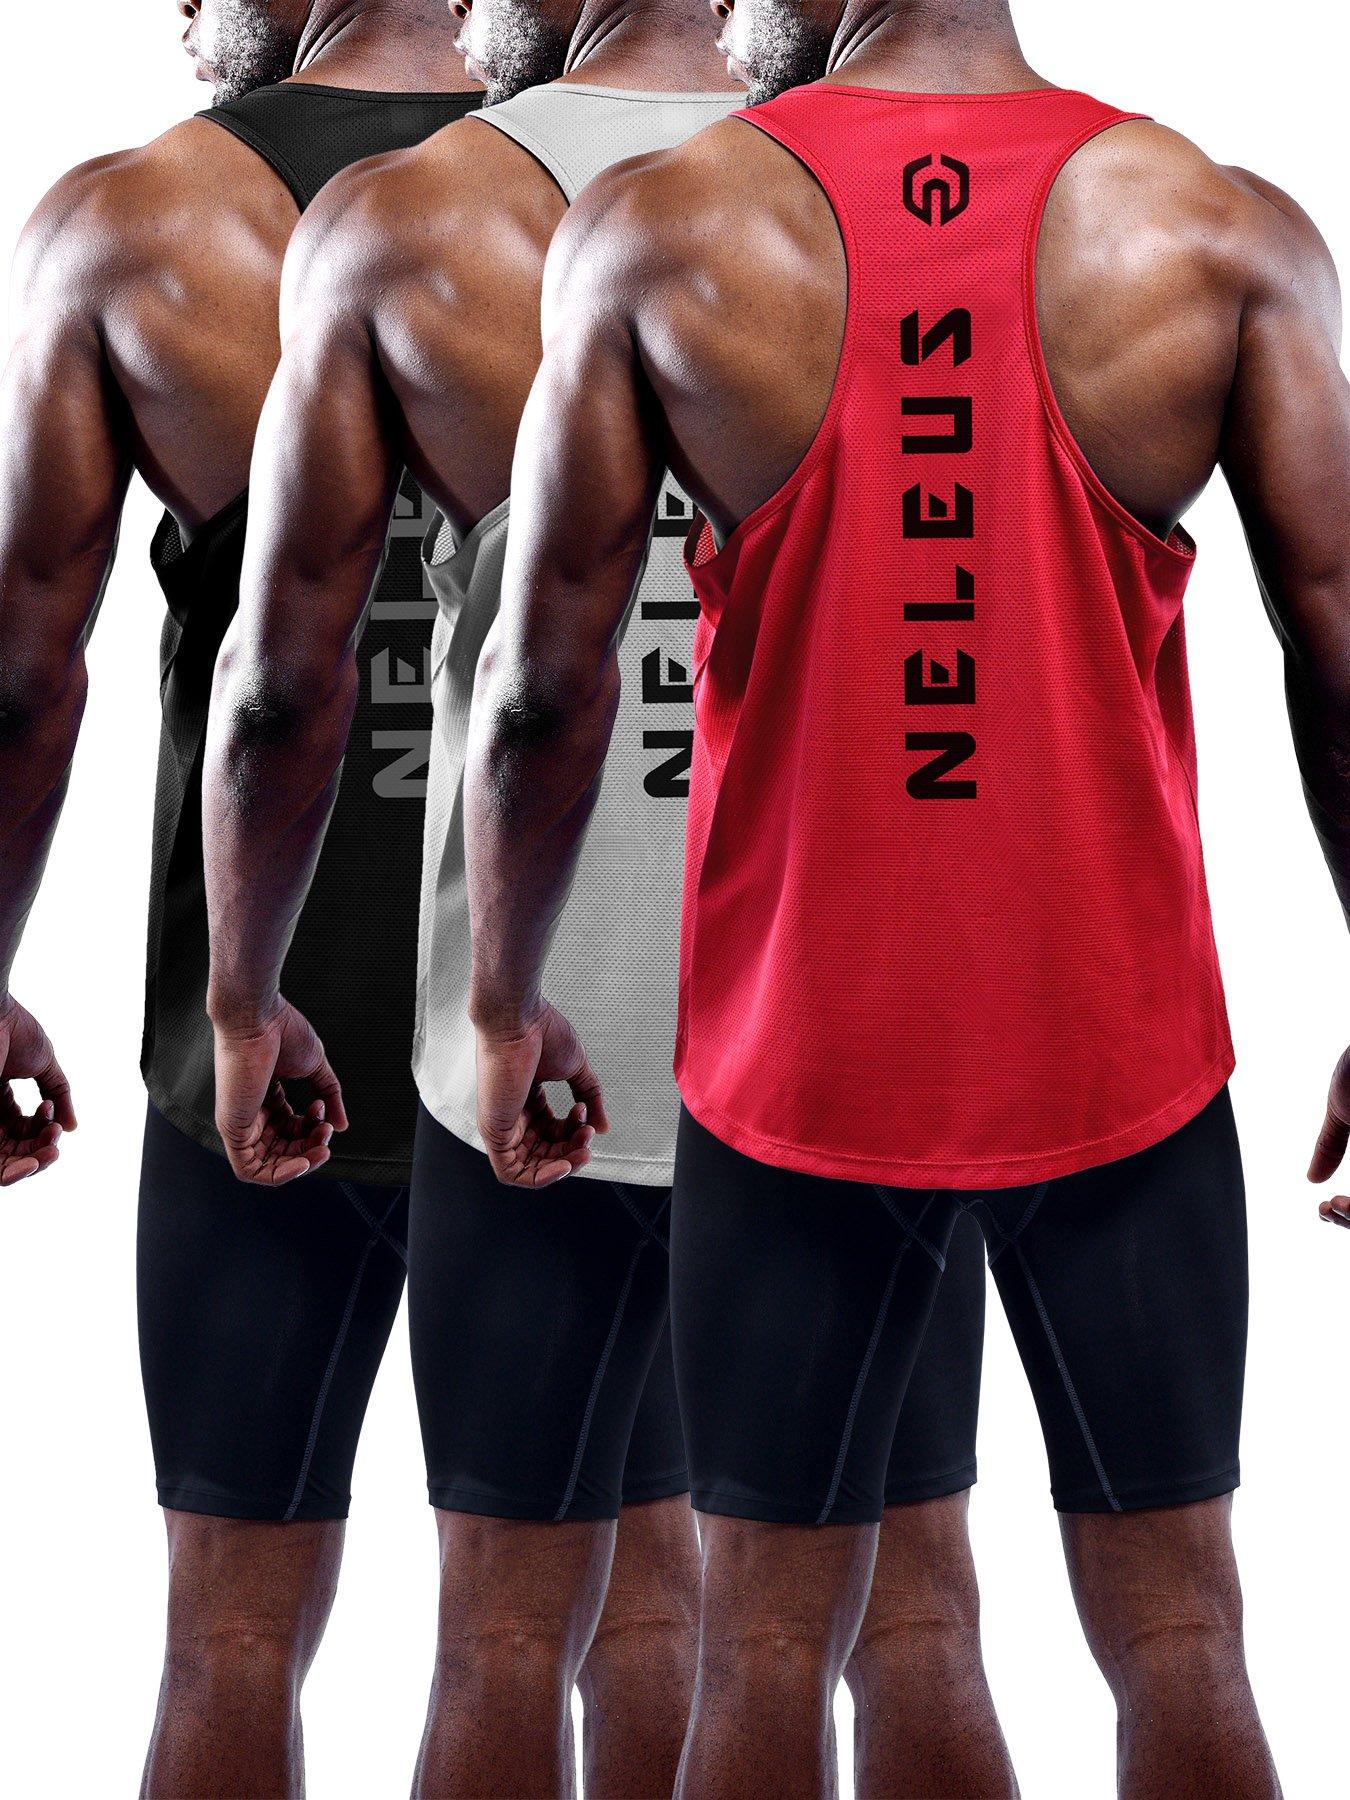 Neleus Men's 3 Pack Dry Fit Athletic Sleeveless Muscle Tank,5031,Black,Grey,Red,M,EU L